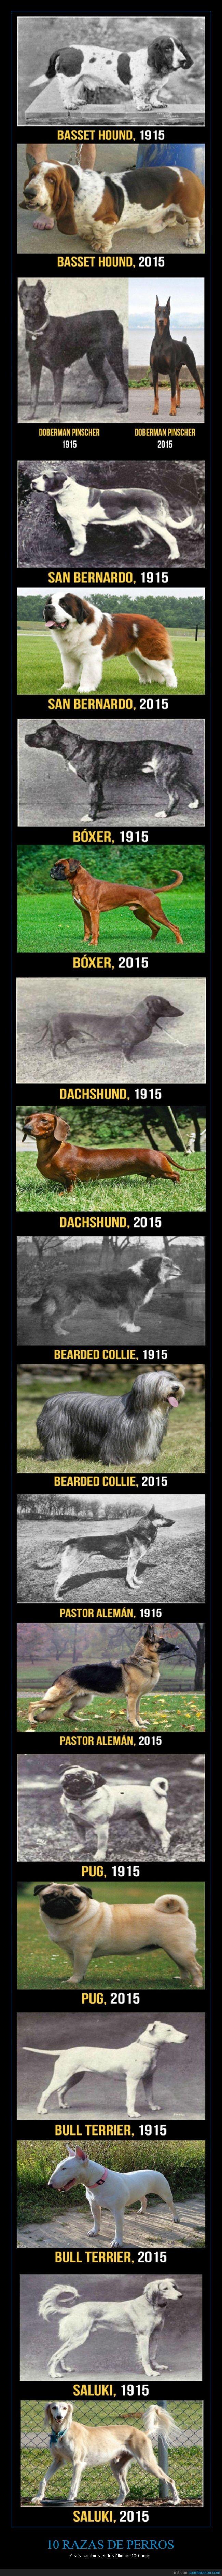 100años,bassethound,beardedcollie,biologia,bóxer,bullterrier,dachshund,doberman,evolución,historia,pastoralemán,perros,pug,razas,saluki,sanbernardo